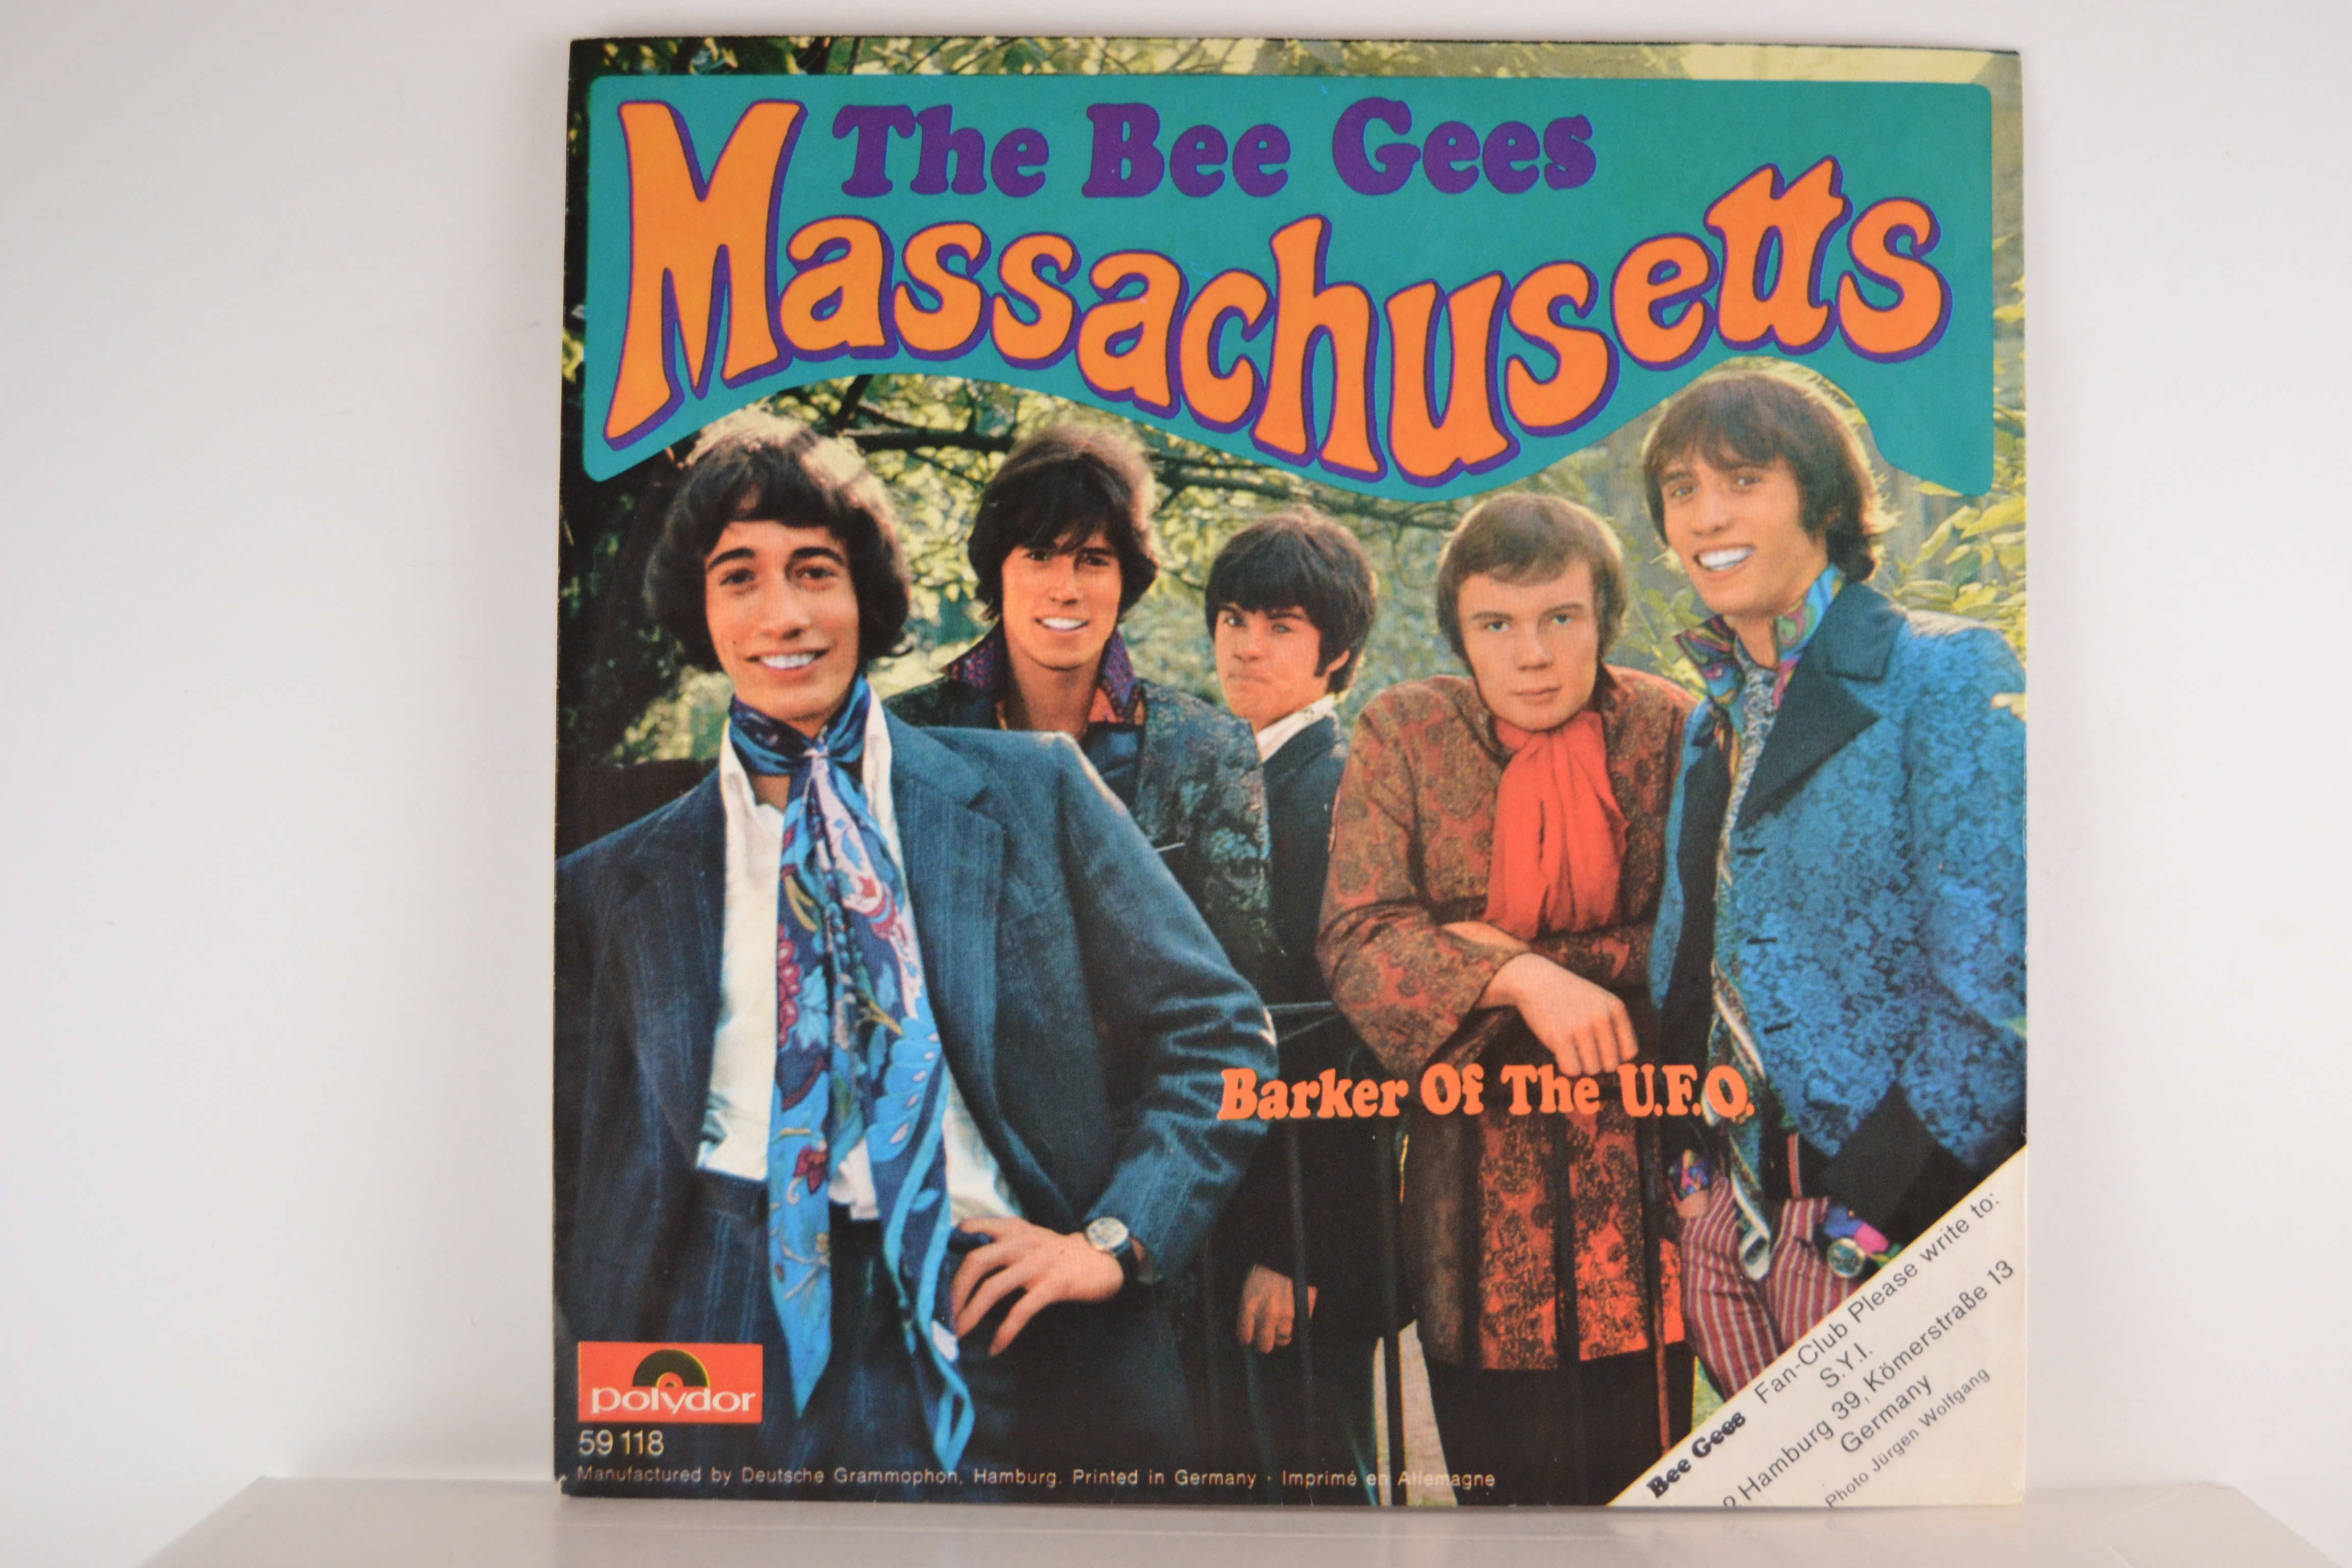 BEE GEES : Massachusetts / Barker of the U.F.O.